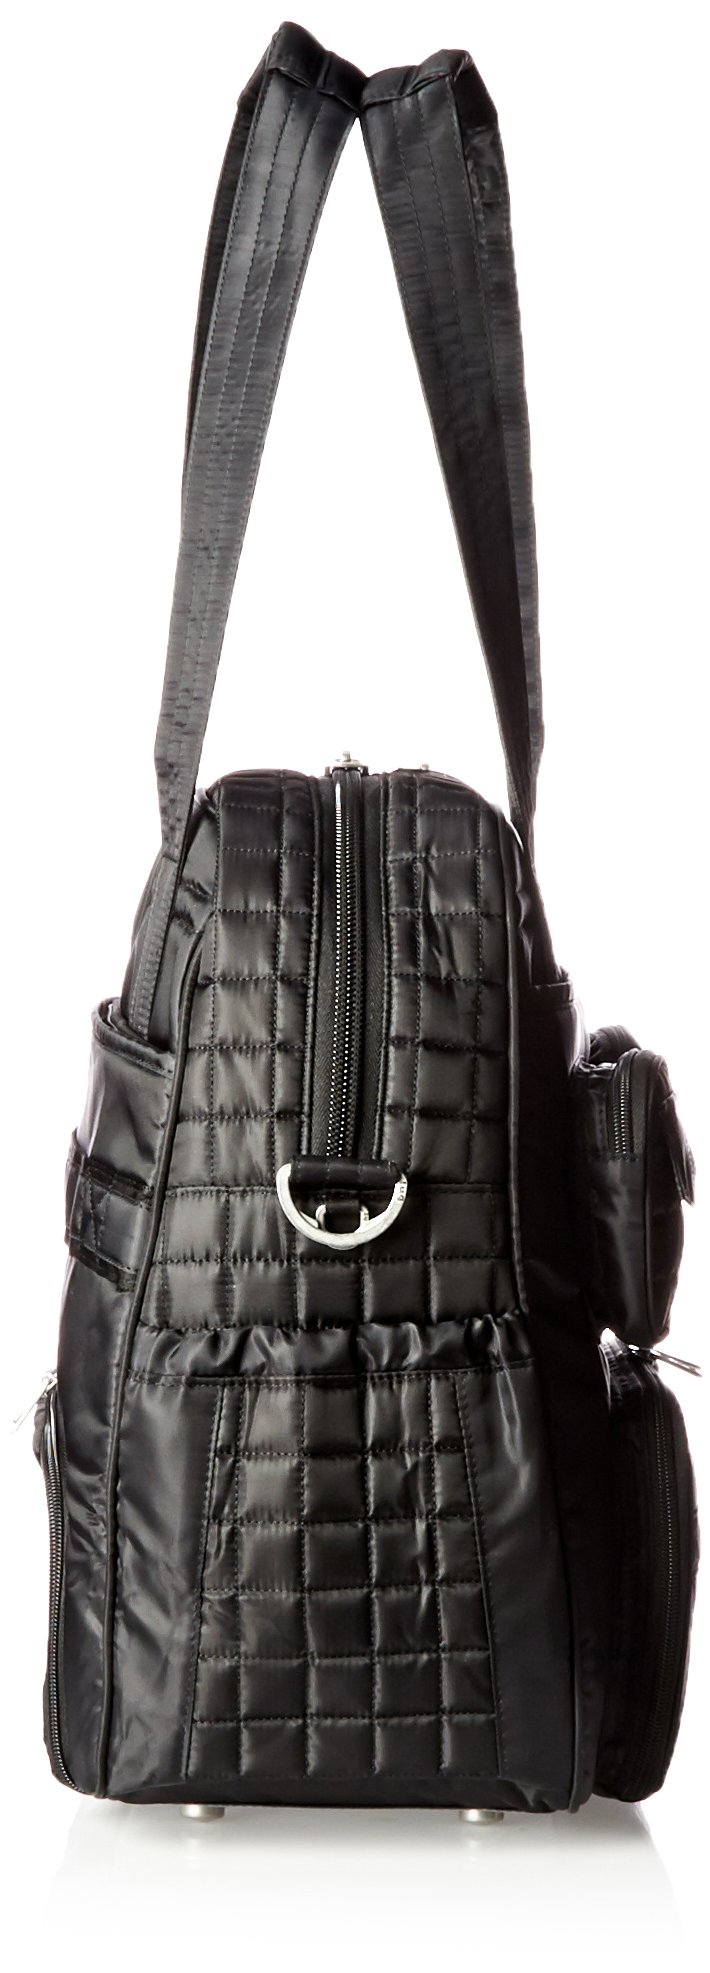 Lug Puddle Jumper Overnight/Gym Bag, Midnight Black by Lug (Image #3)